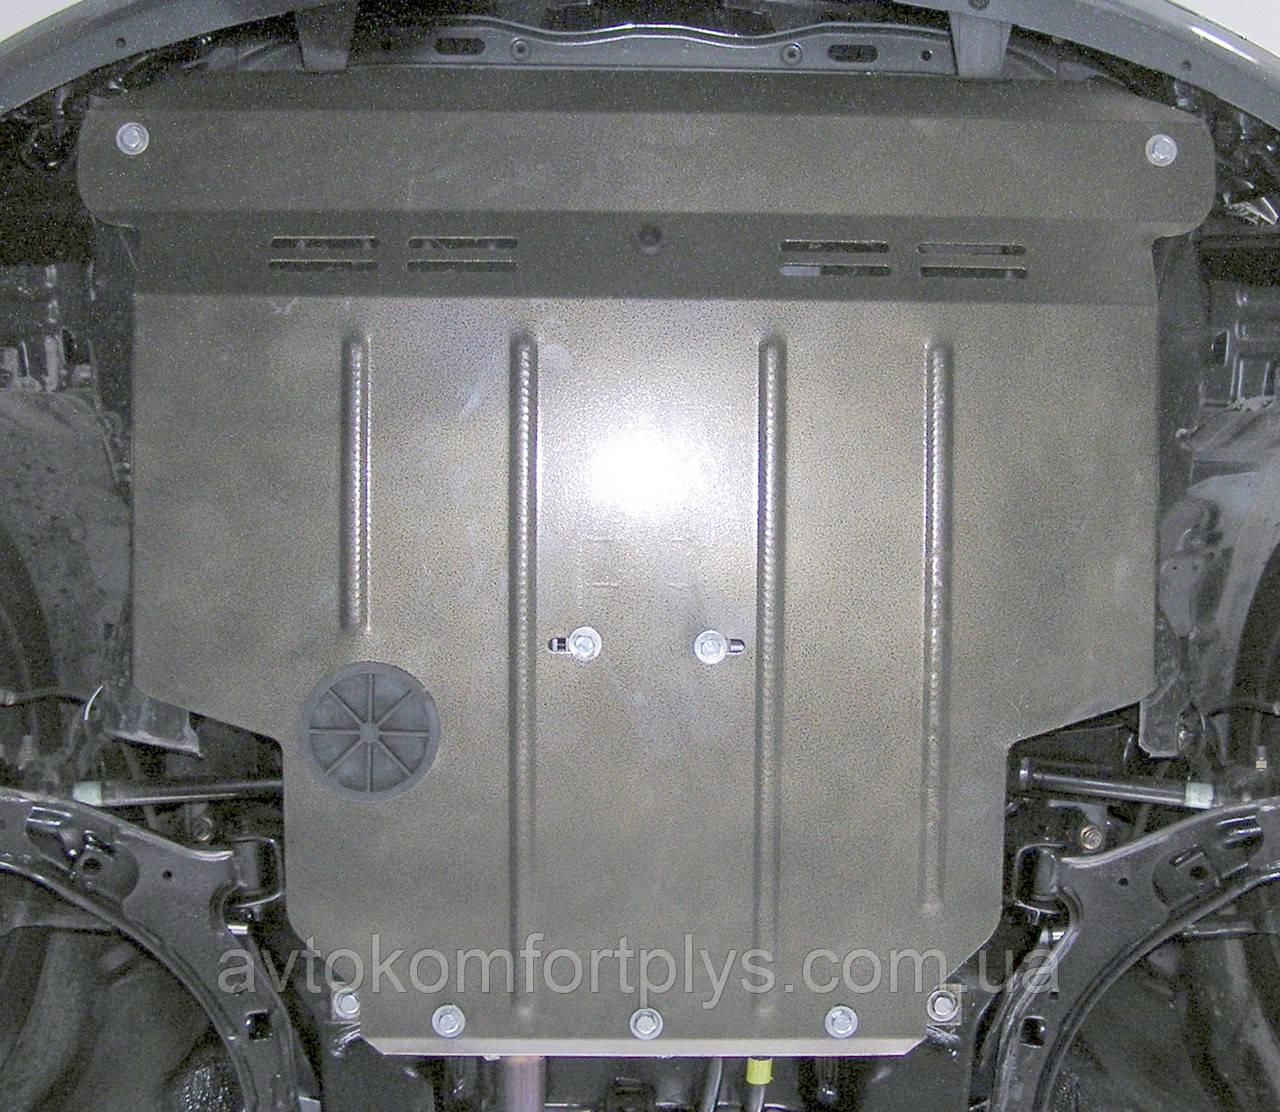 Металева (сталева) захист двигуна (картера) Nissan Almera II (2000-) (всі об'єми)